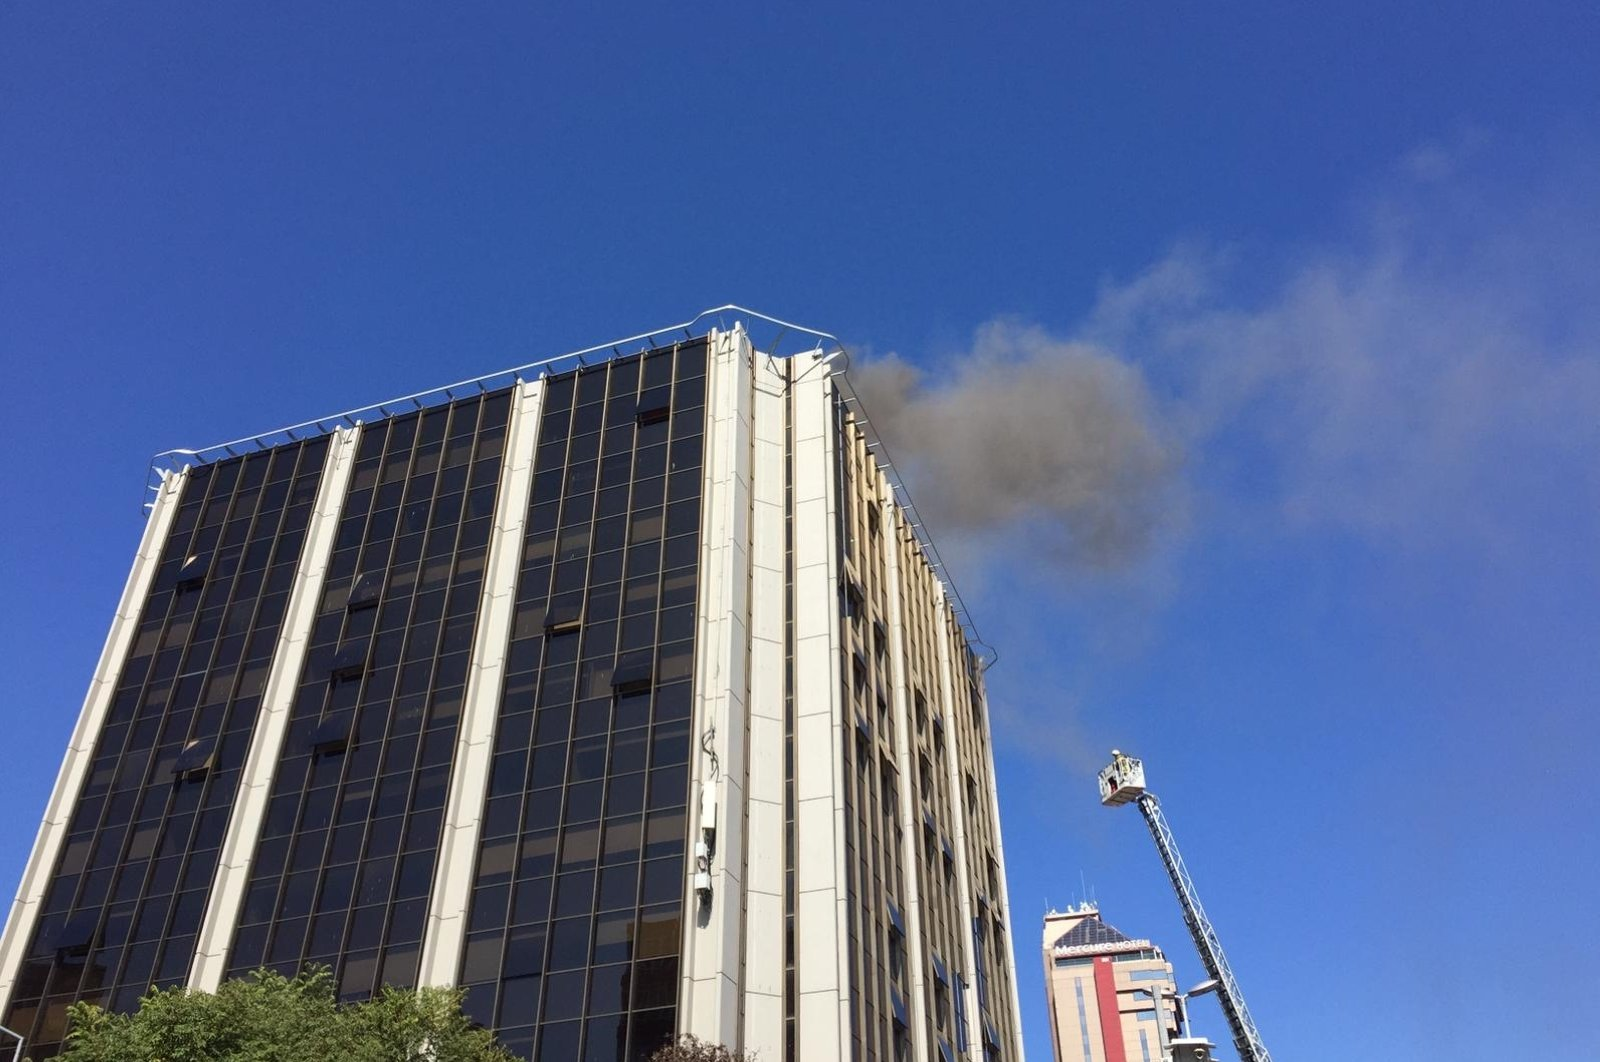 Smoke billows over the building in Beşiktaş district, Istanbul, Turkey, Sept. 27, 2020. (AA Photo)